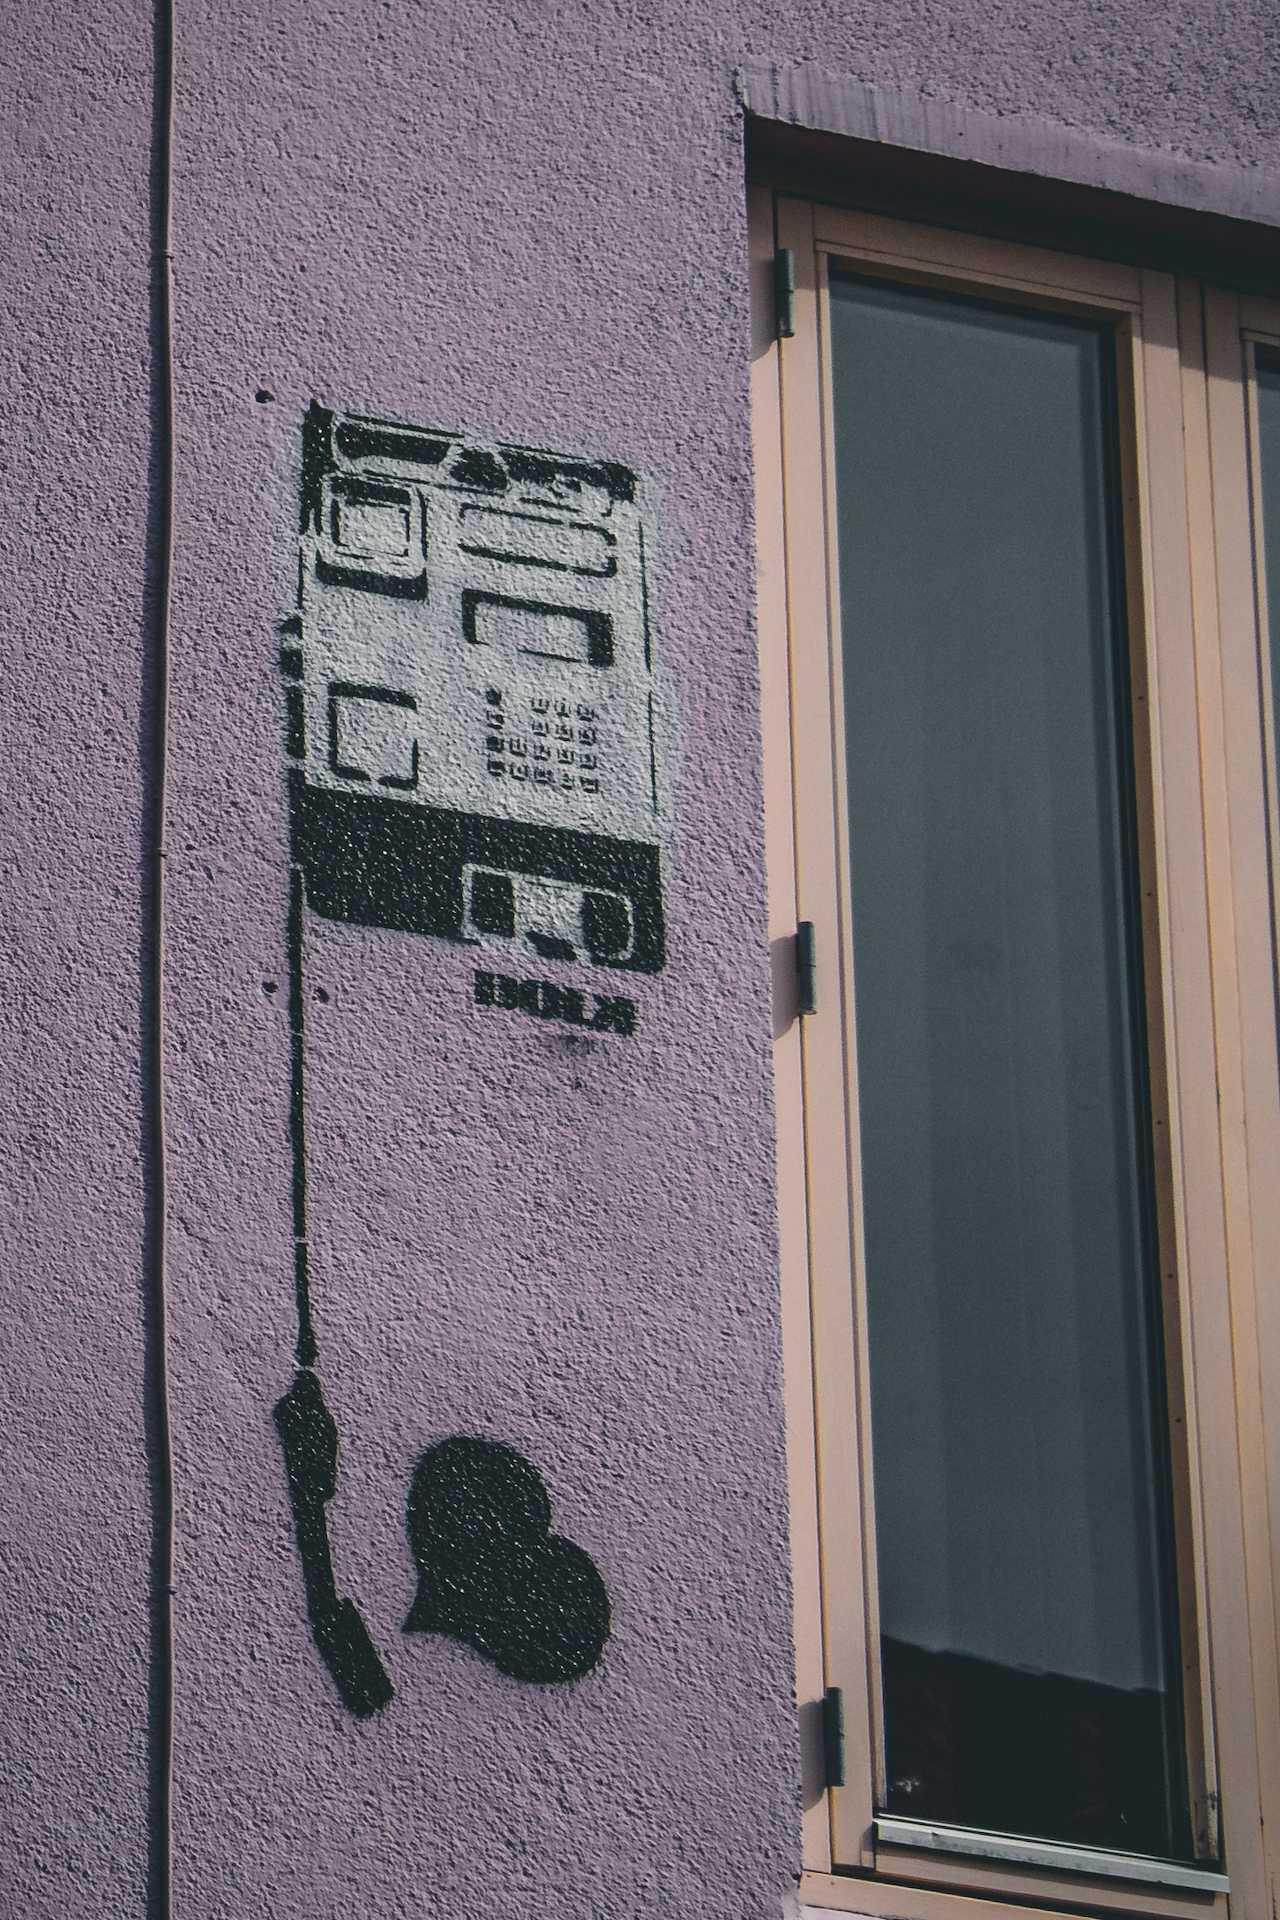 norweski street art